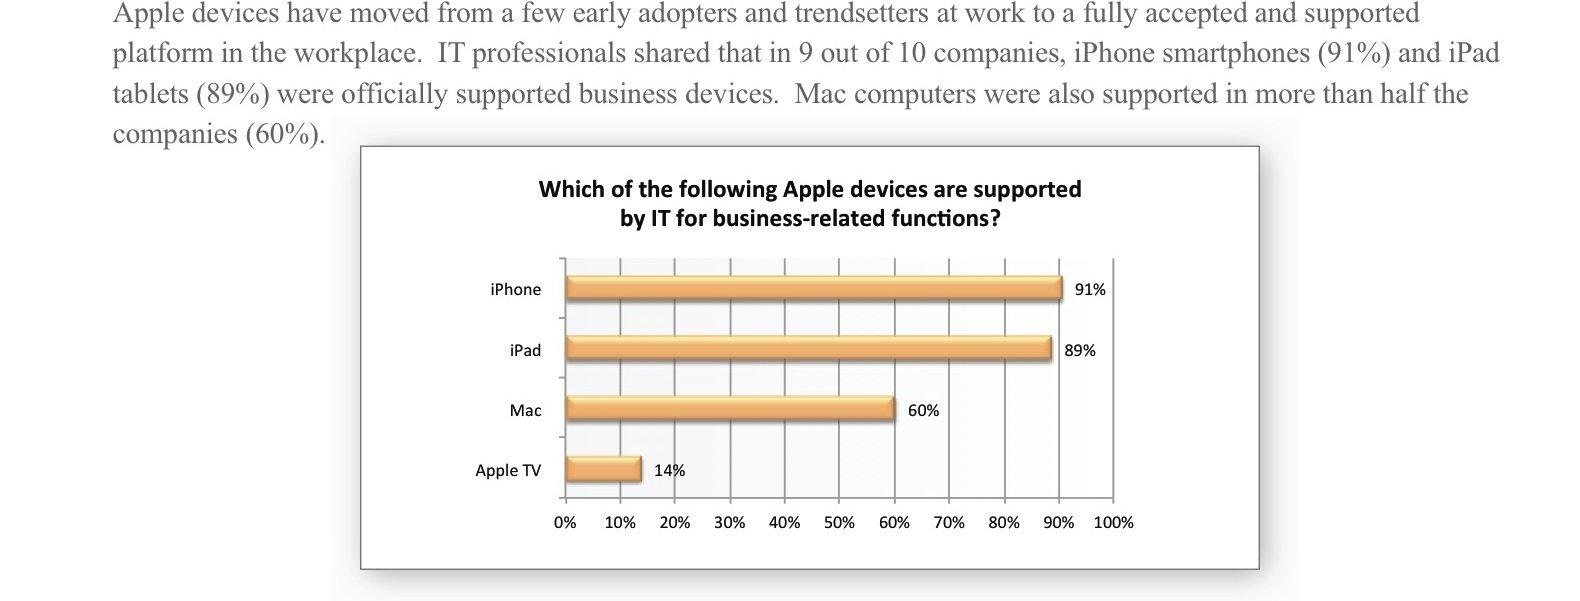 jamf-apple-enterprise-survey-1.jpg